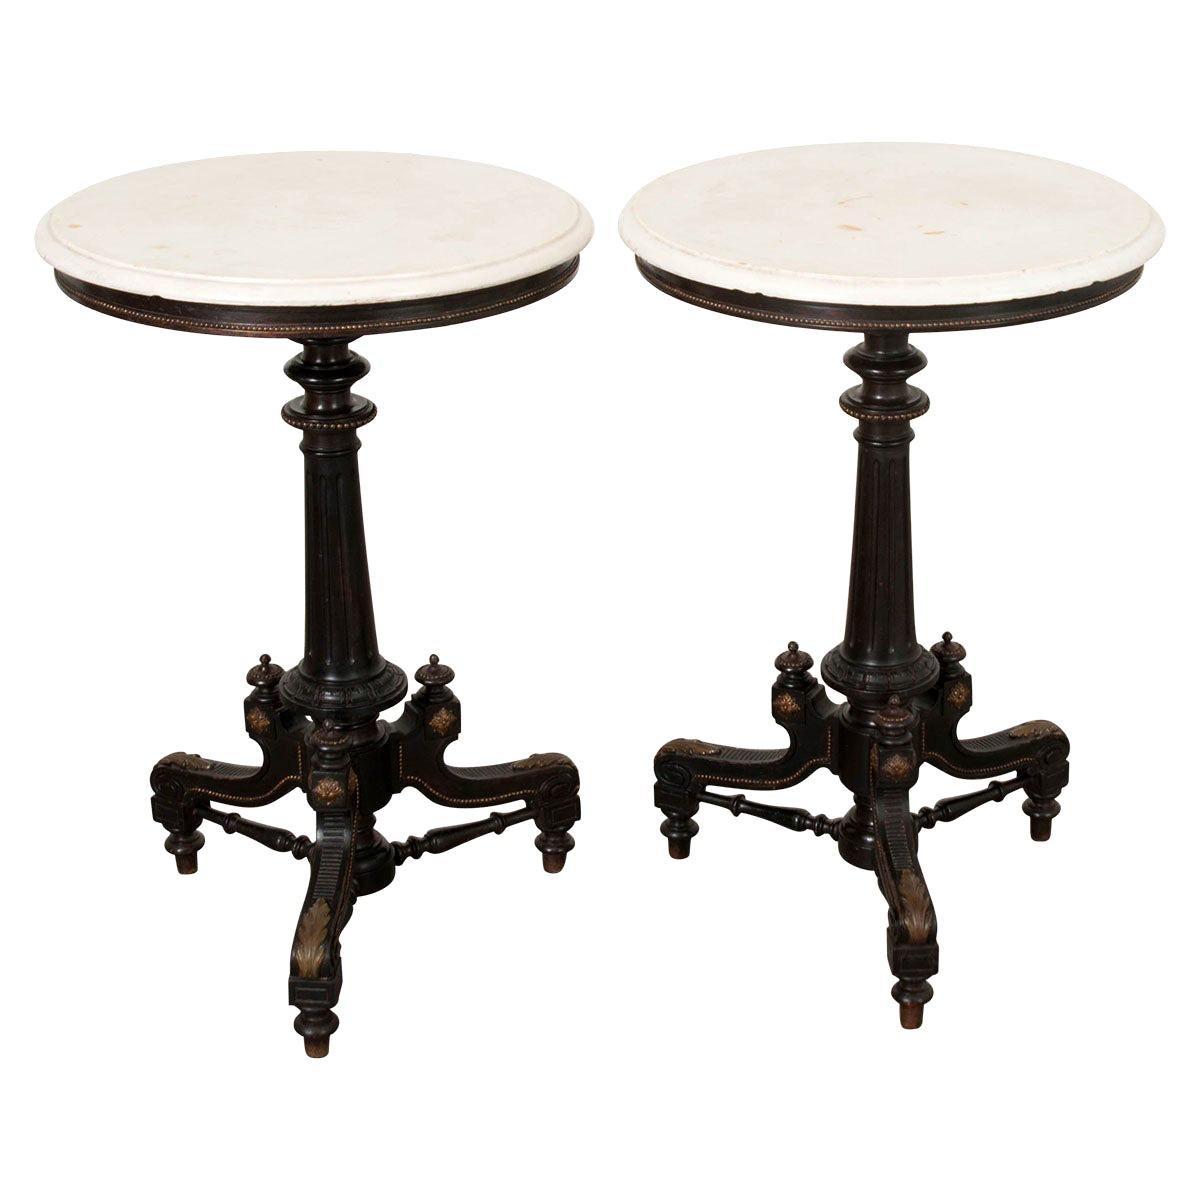 Pair of Italian Renaissance Revival Side Tables